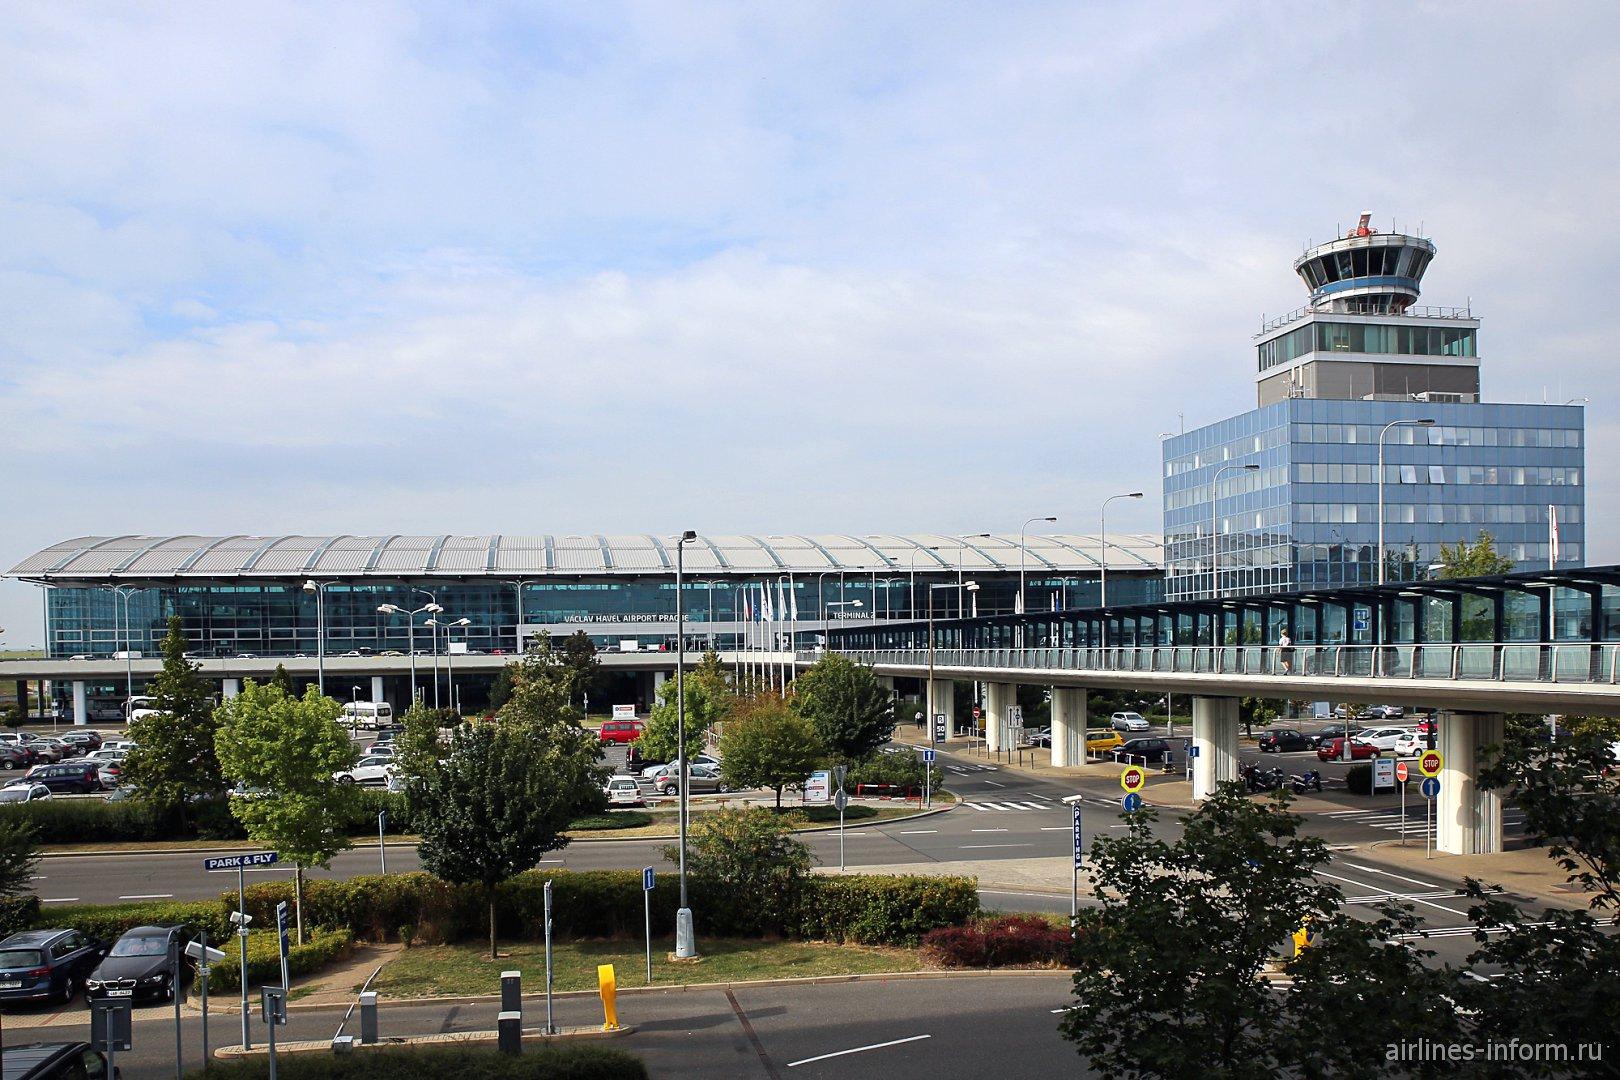 Терминал 2 аэропорта Прага Вацлав Гавел